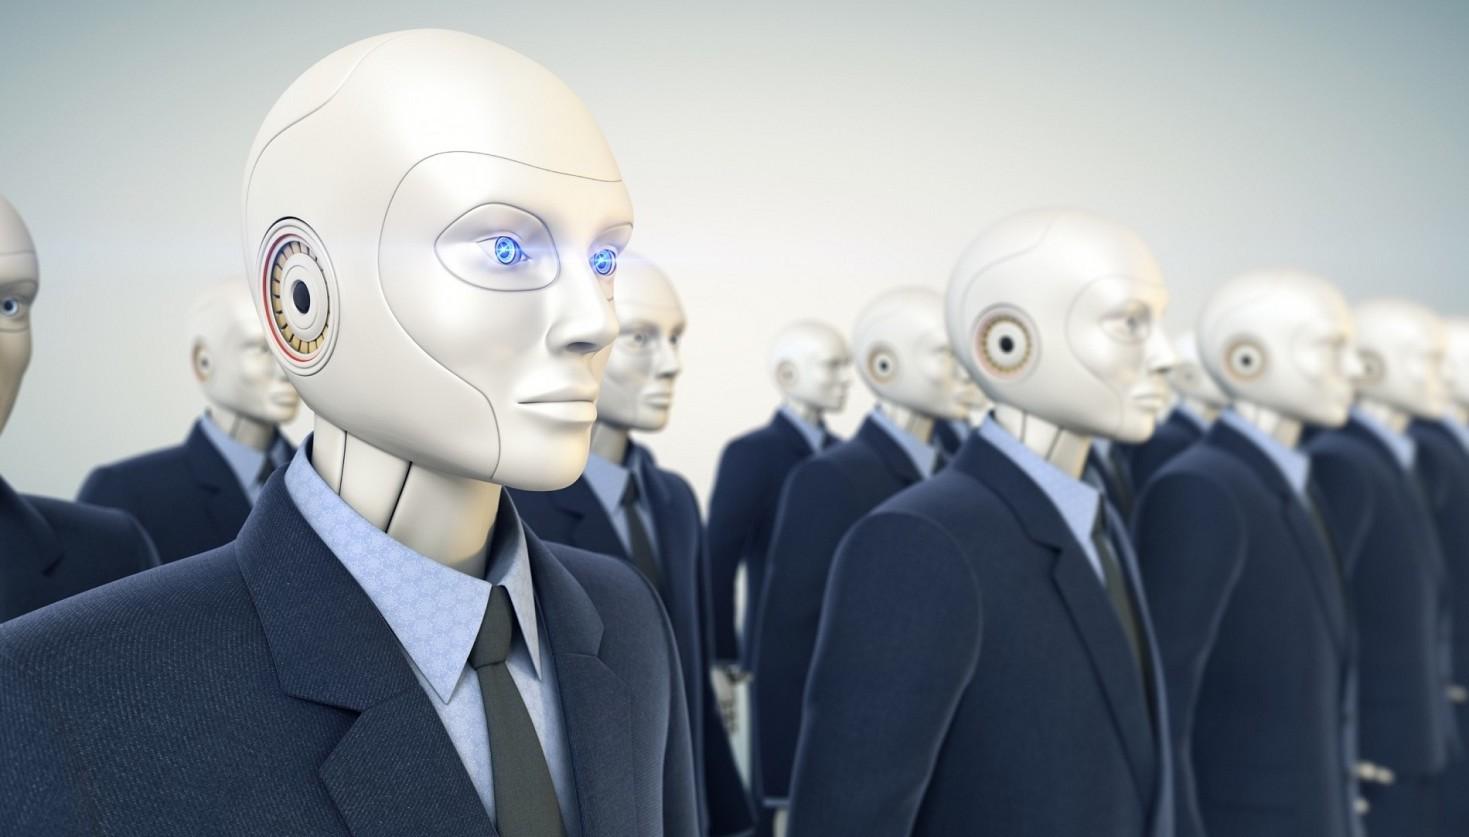 Giappone: robot, aziende li assumono sem